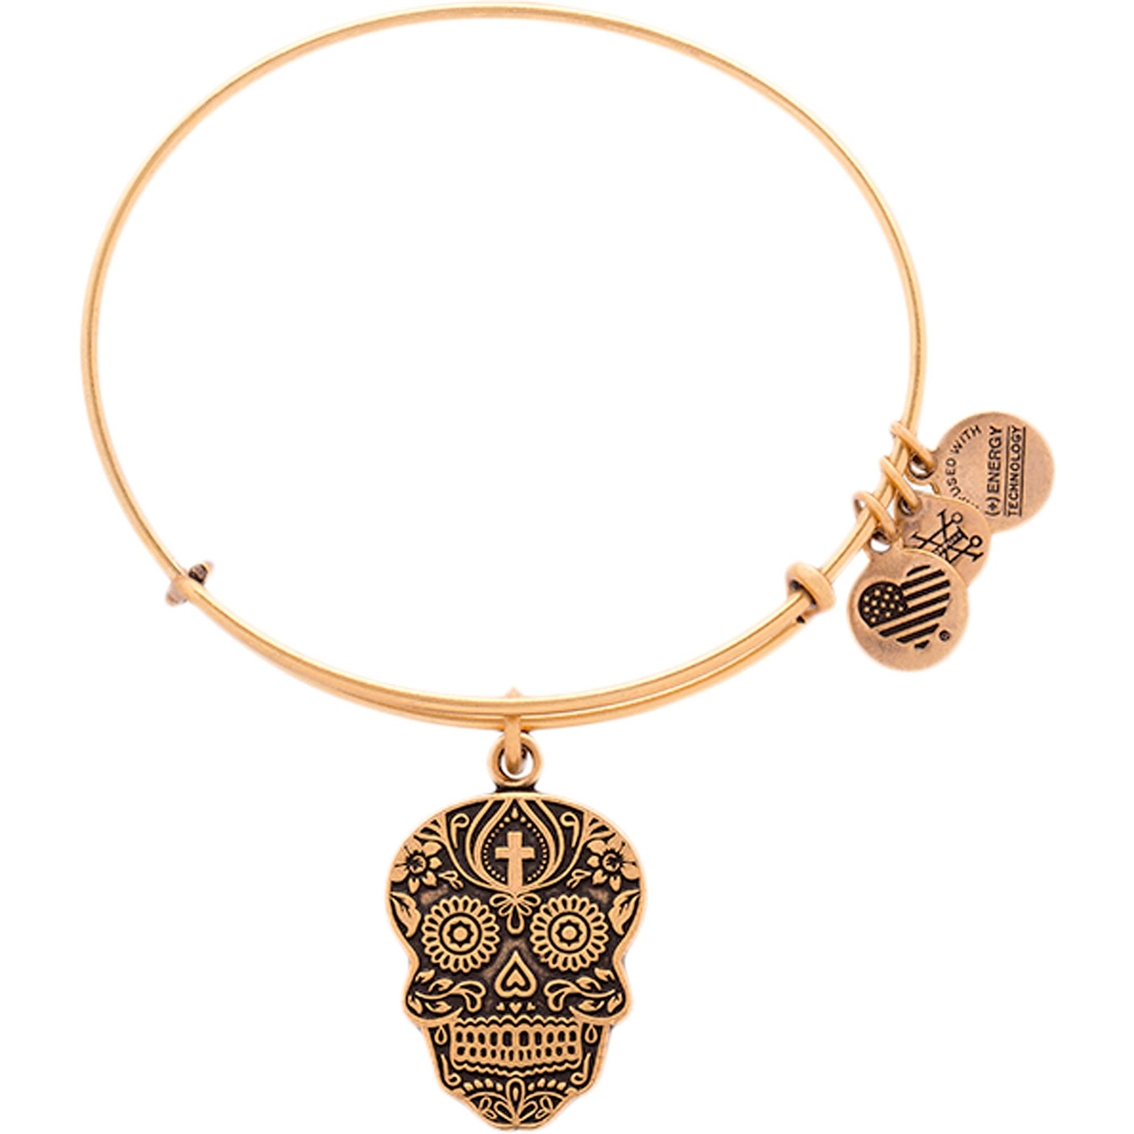 Alex And Ani Calavera Charm Bangle Fashion Bracelets Jewelry